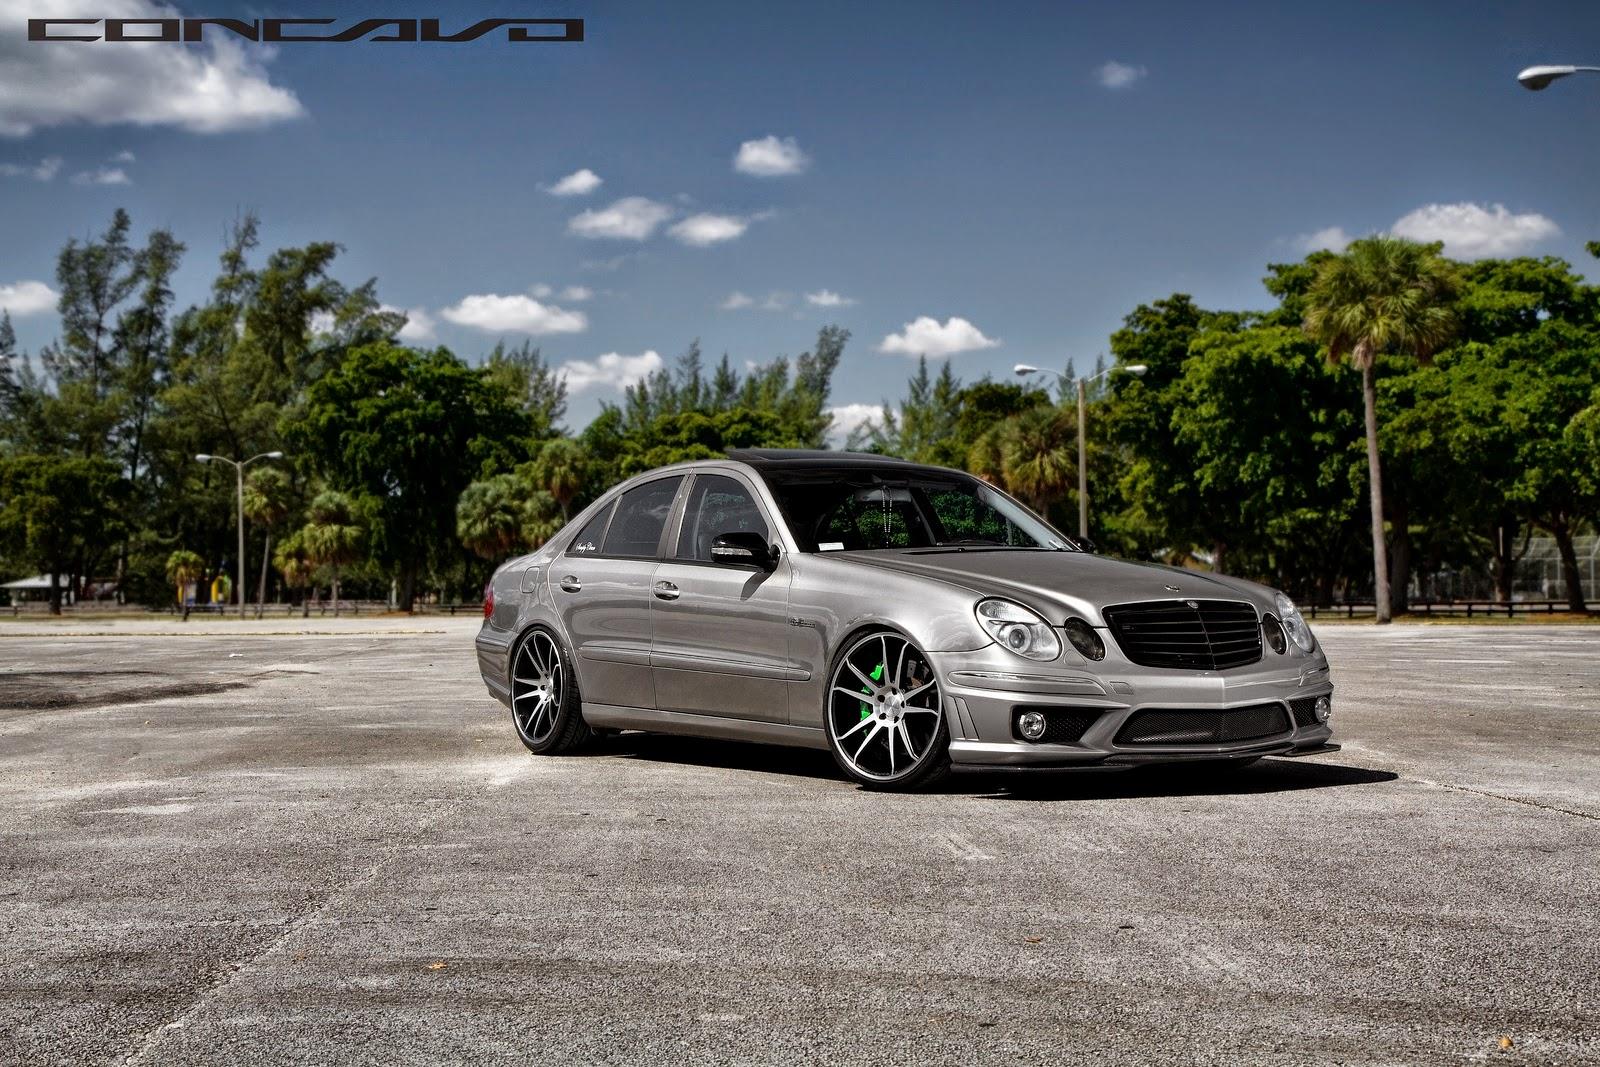 Mercedes Benz W211 E500 On Concavo Cw 5s Benztuning